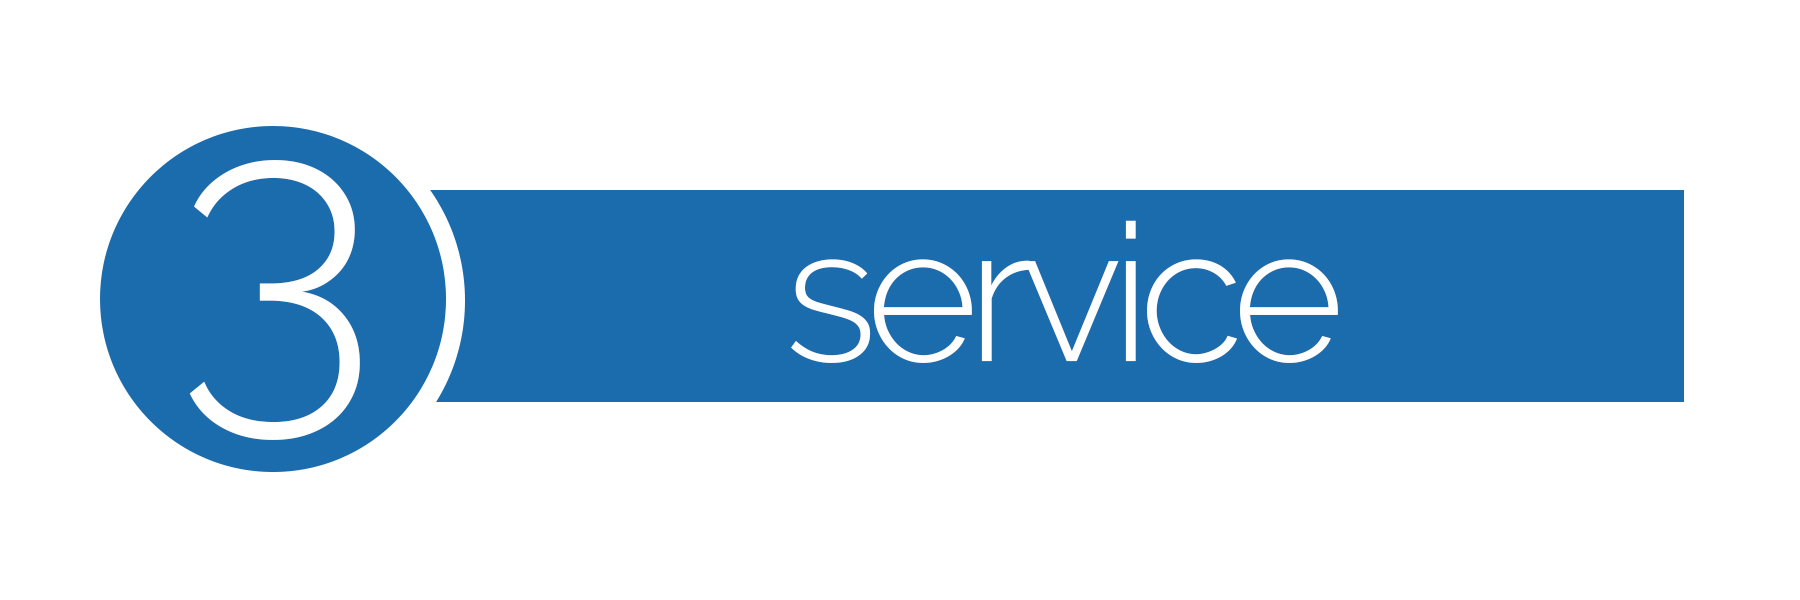 Core values #3 service